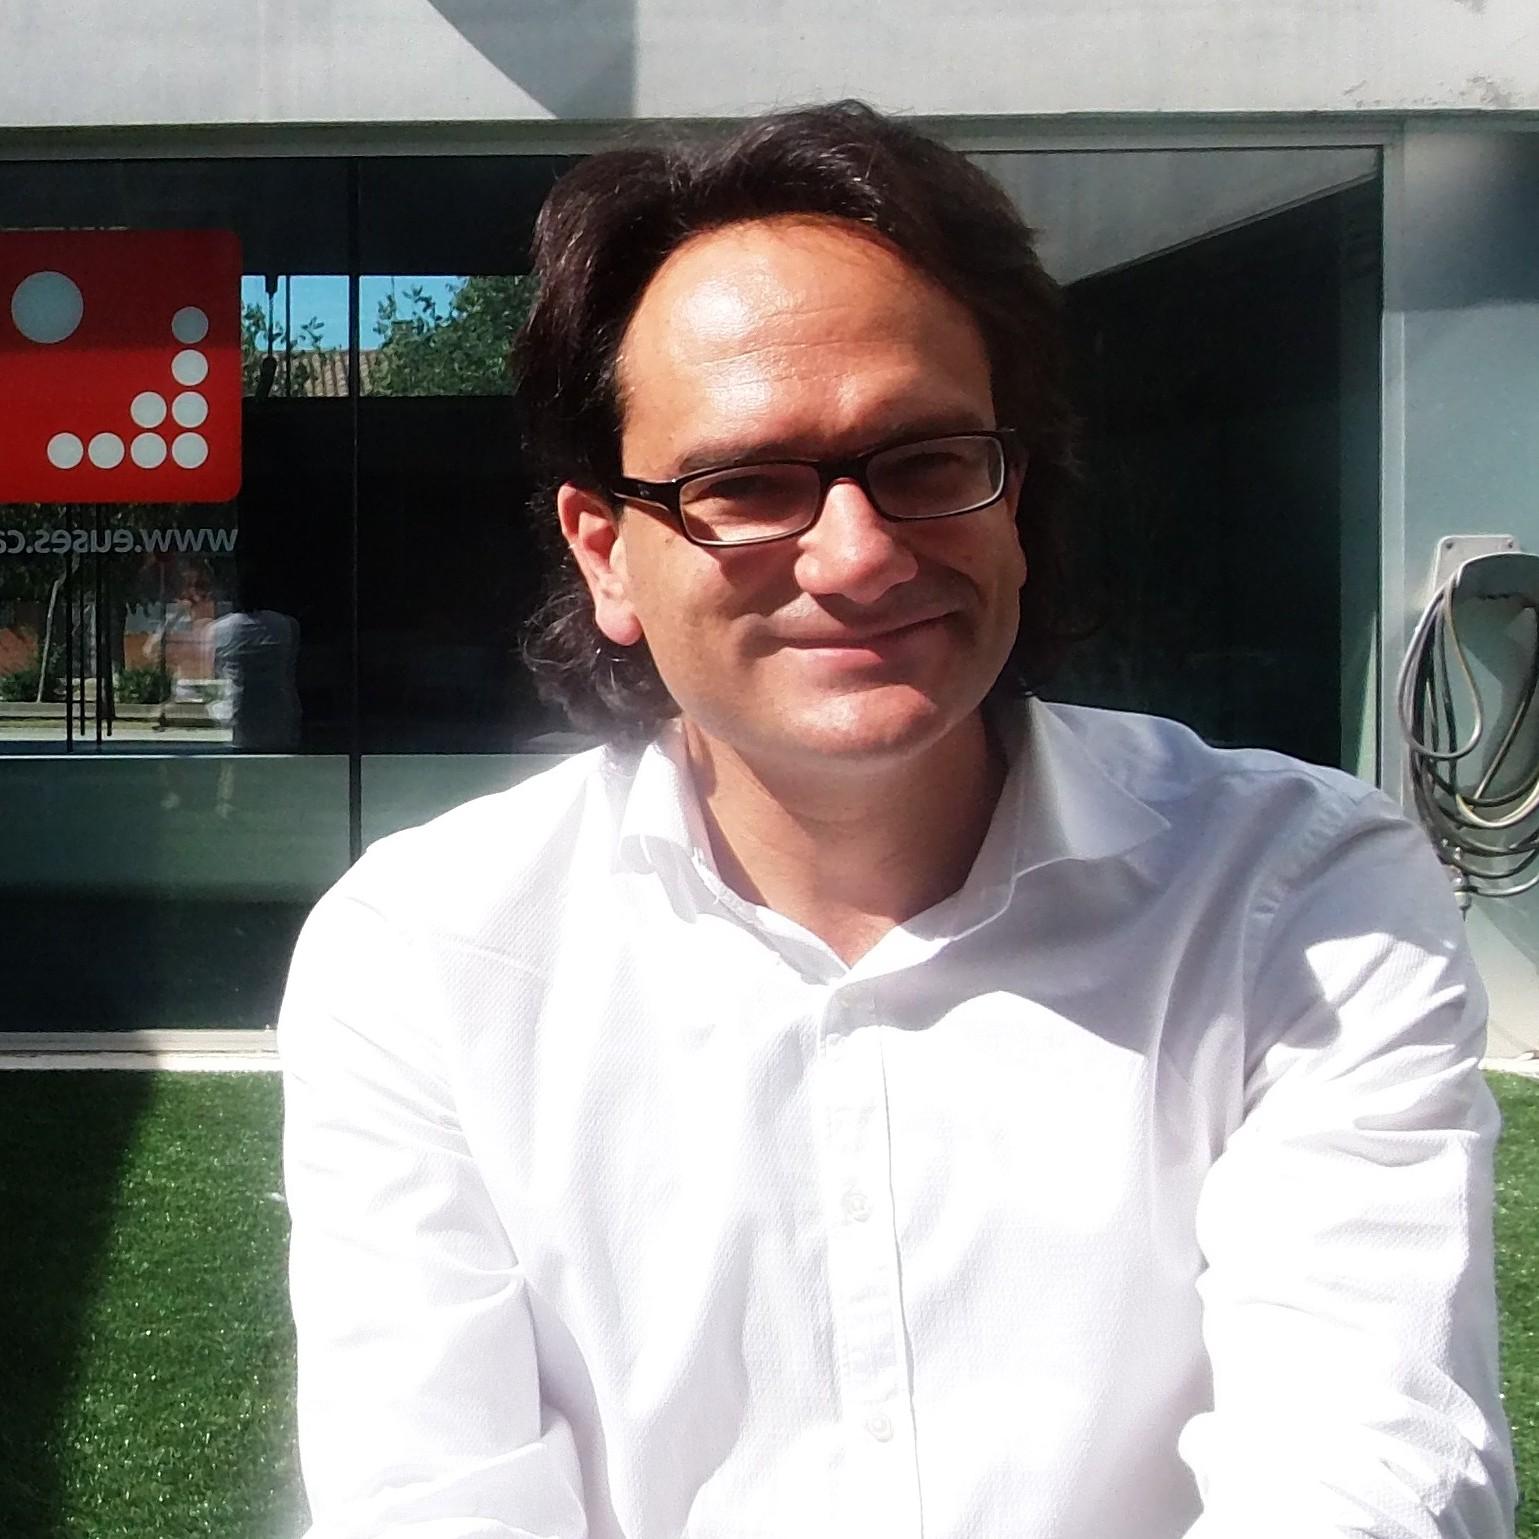 Marcos Reinado Romera